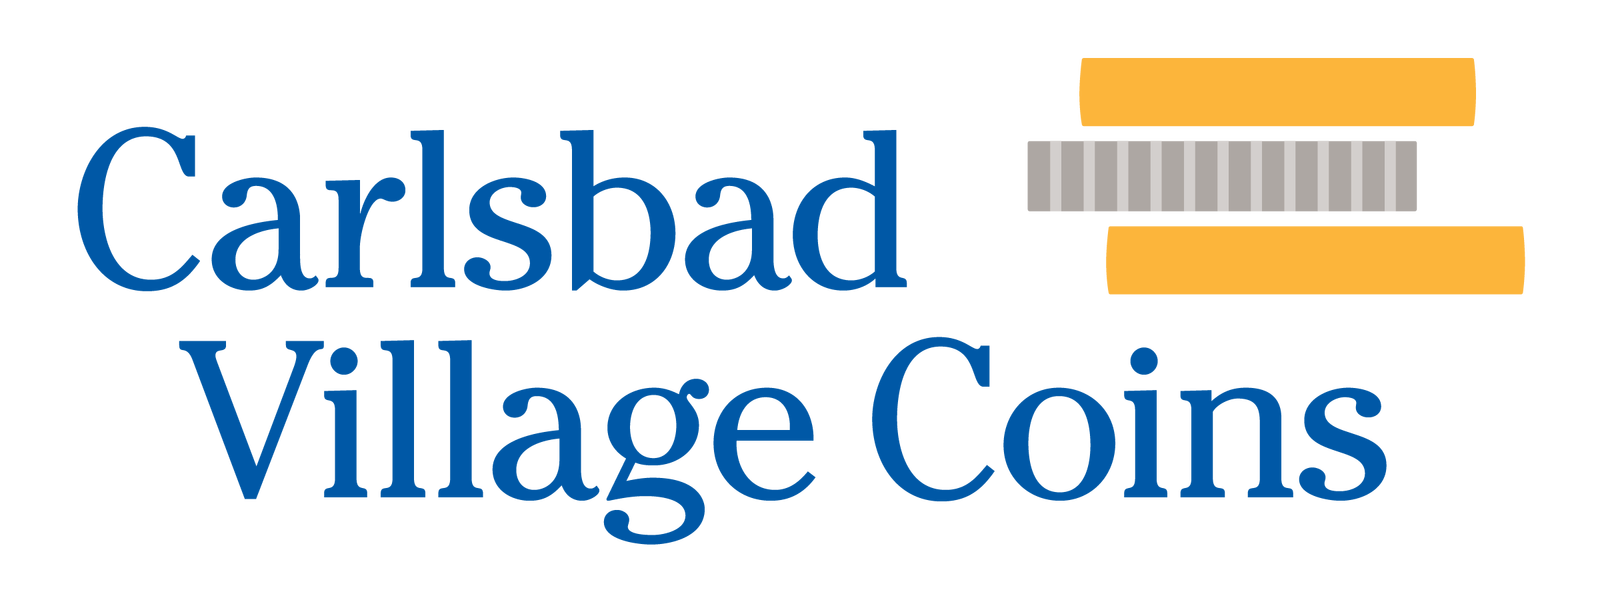 Carlsbad Village Coins